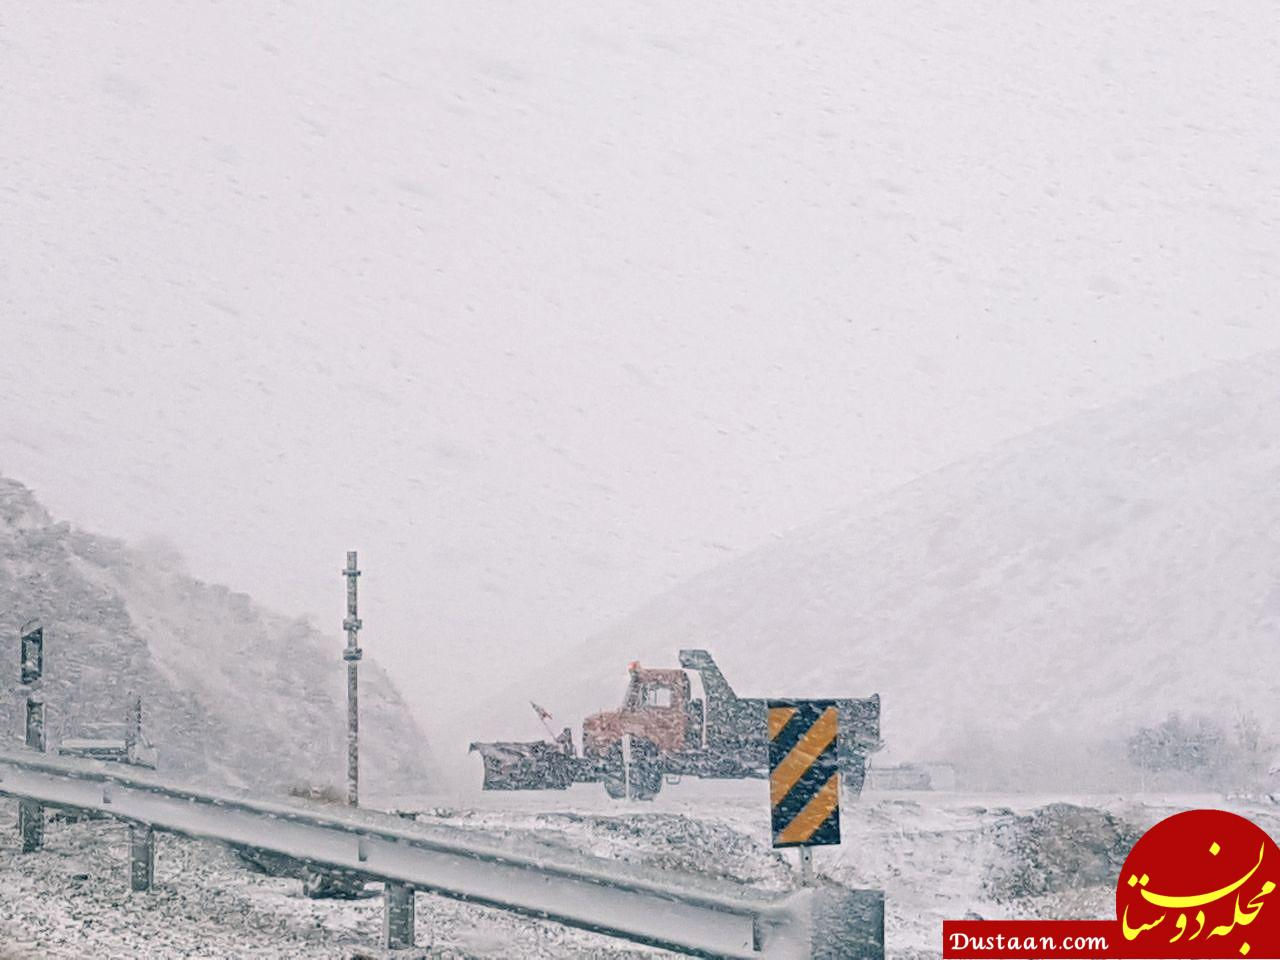 www.dustaan.com کولاک برف در جاده سقز +عکس